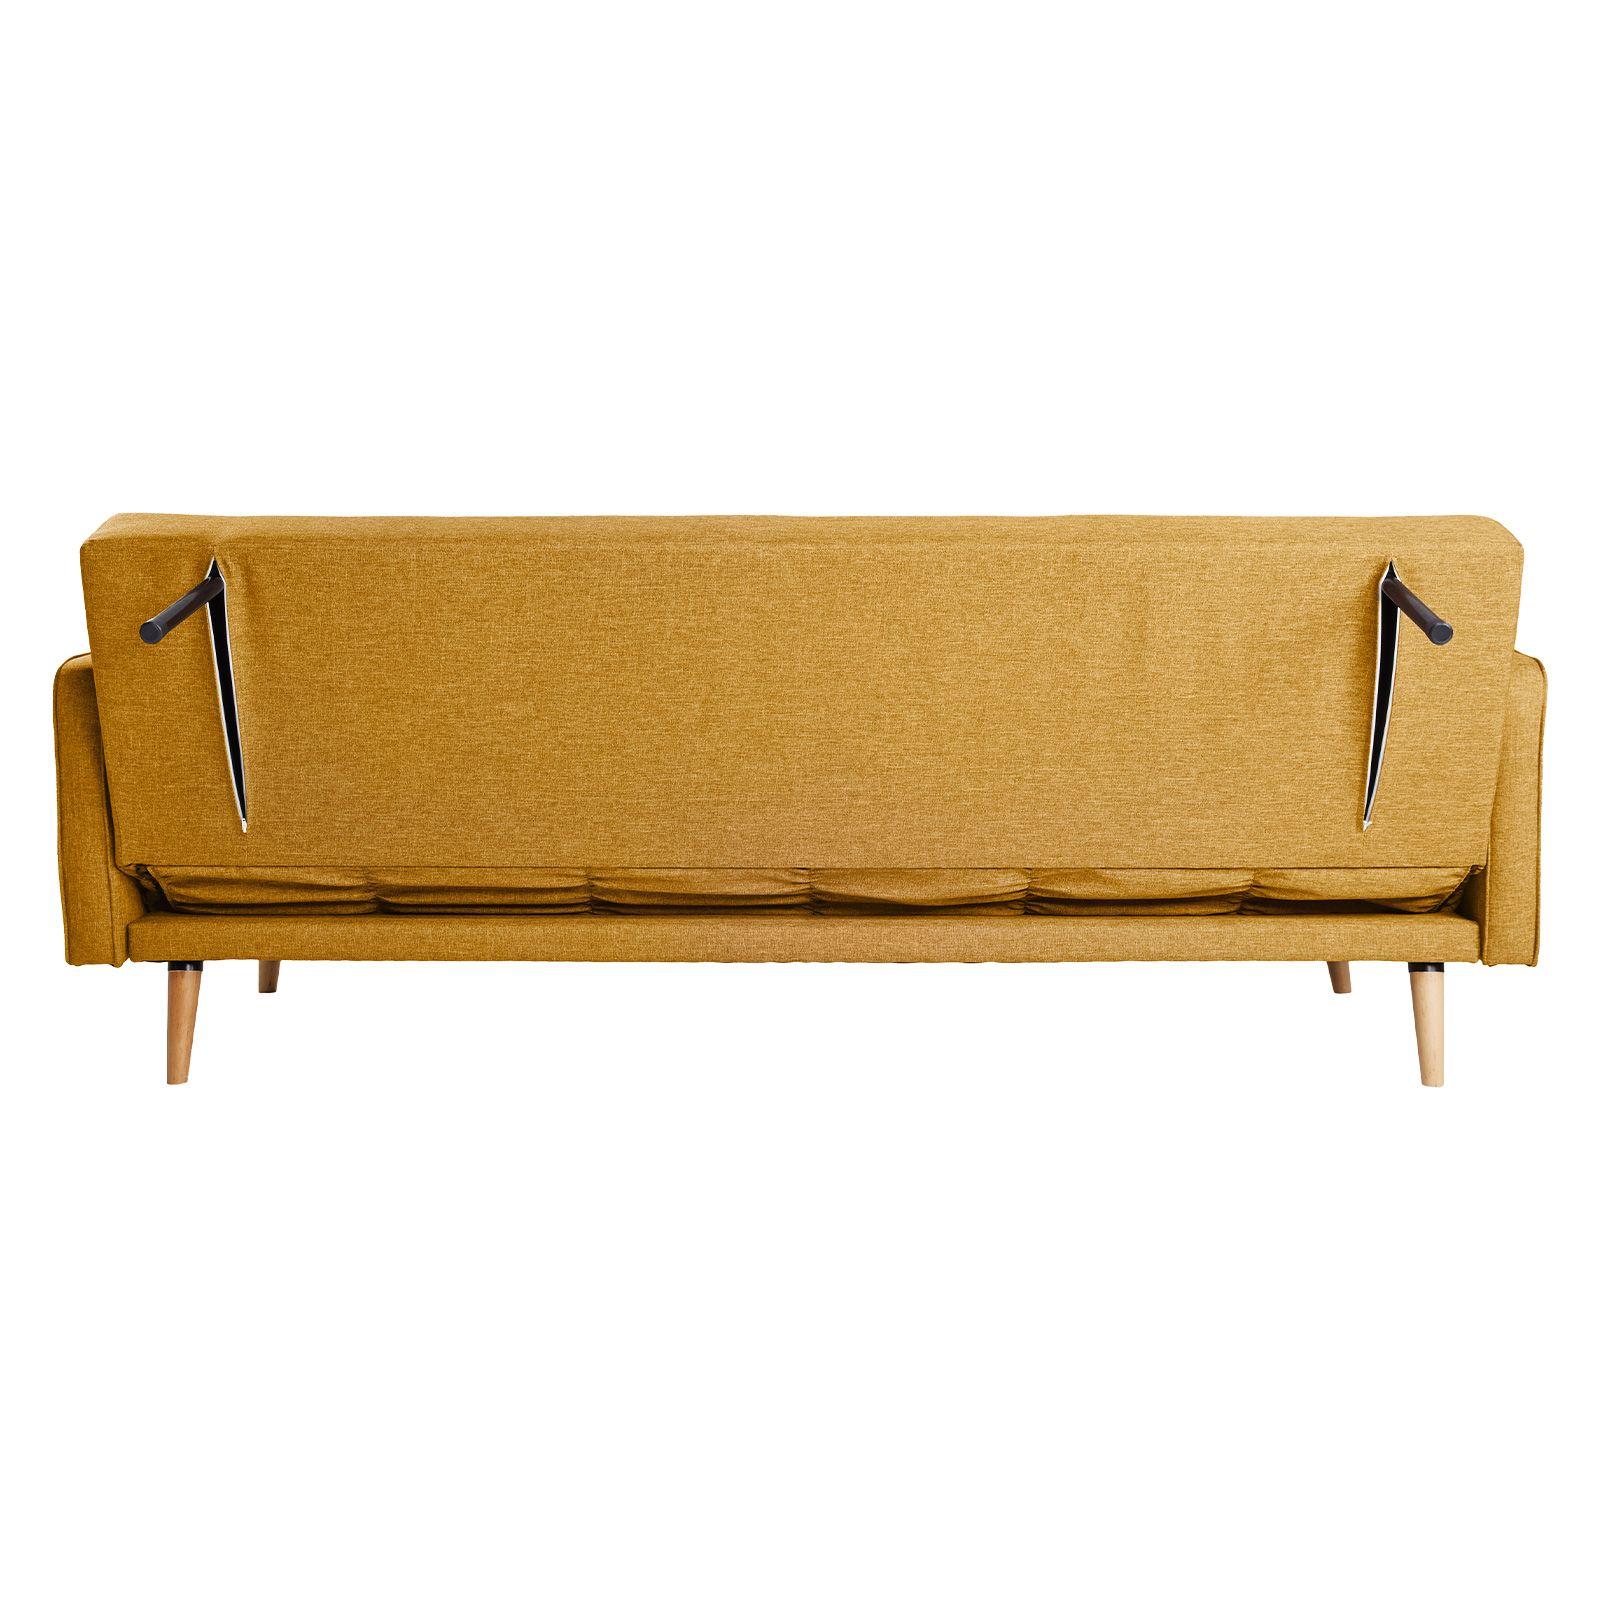 HAMILGON | Sofá cama con brazos tapizado en mostaza (208 x 86 x 81cm)